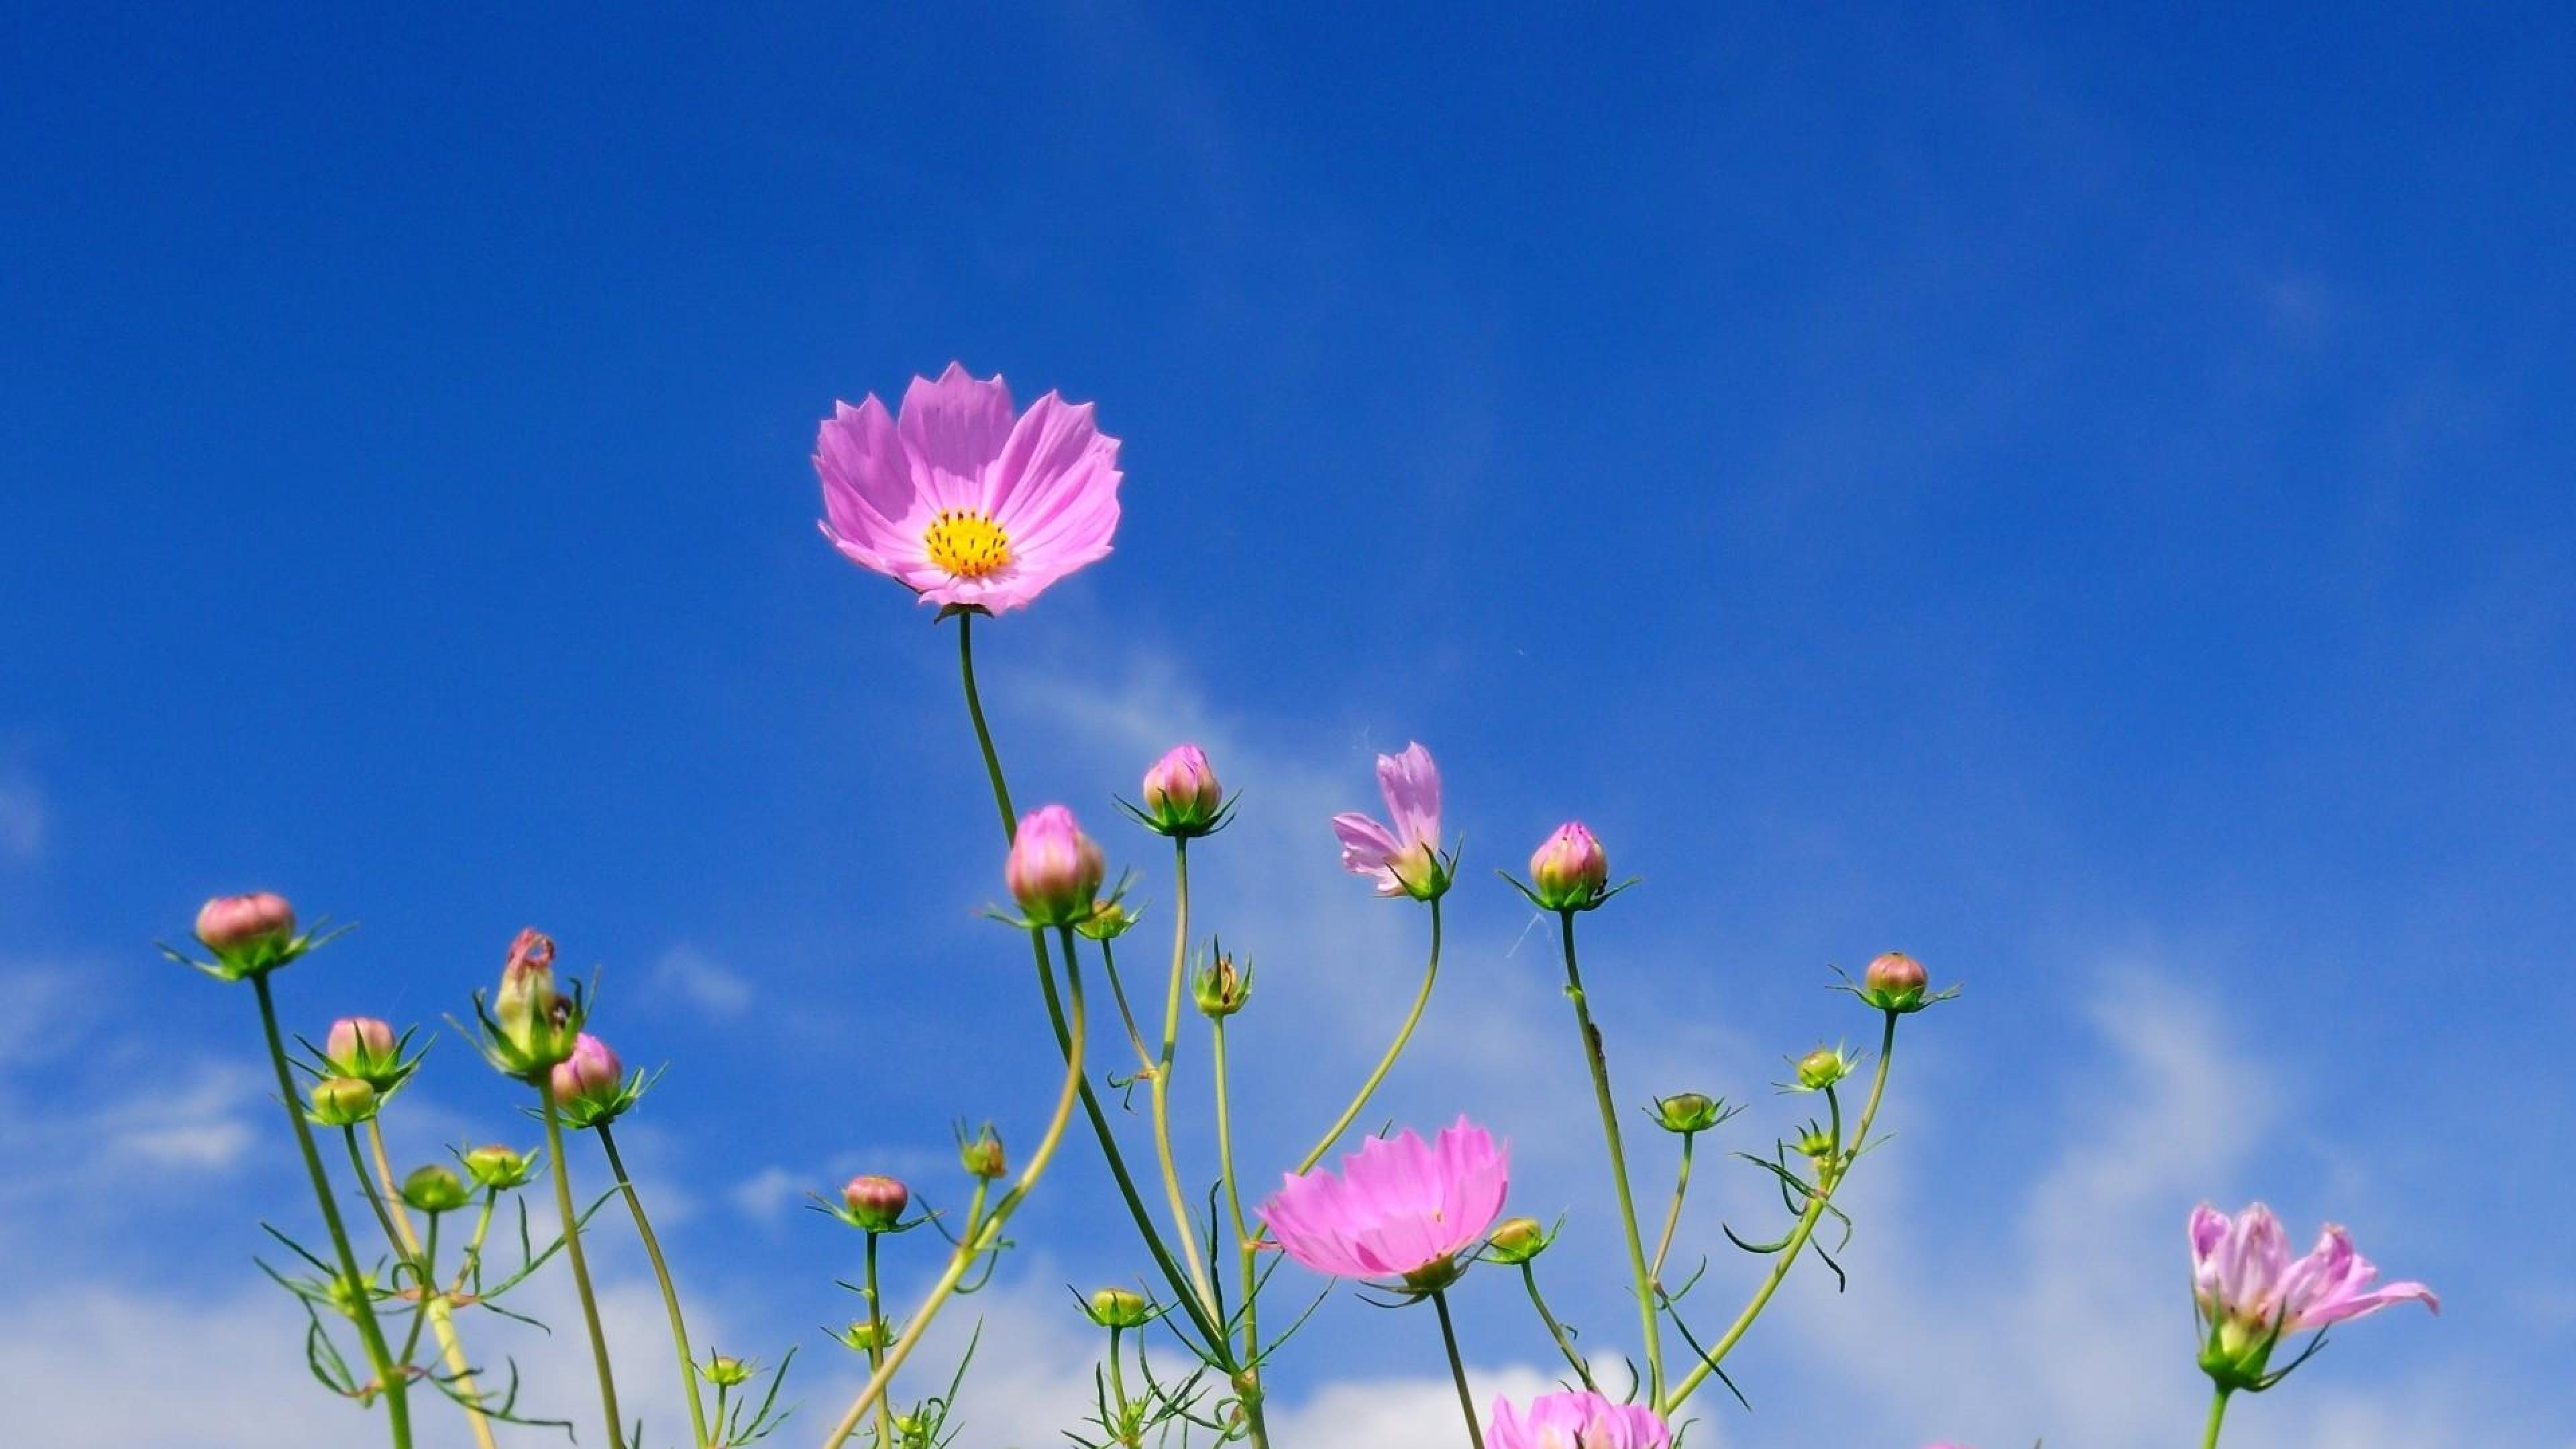 Wallpaper kosmeya, flowers, sky, blue, clouds